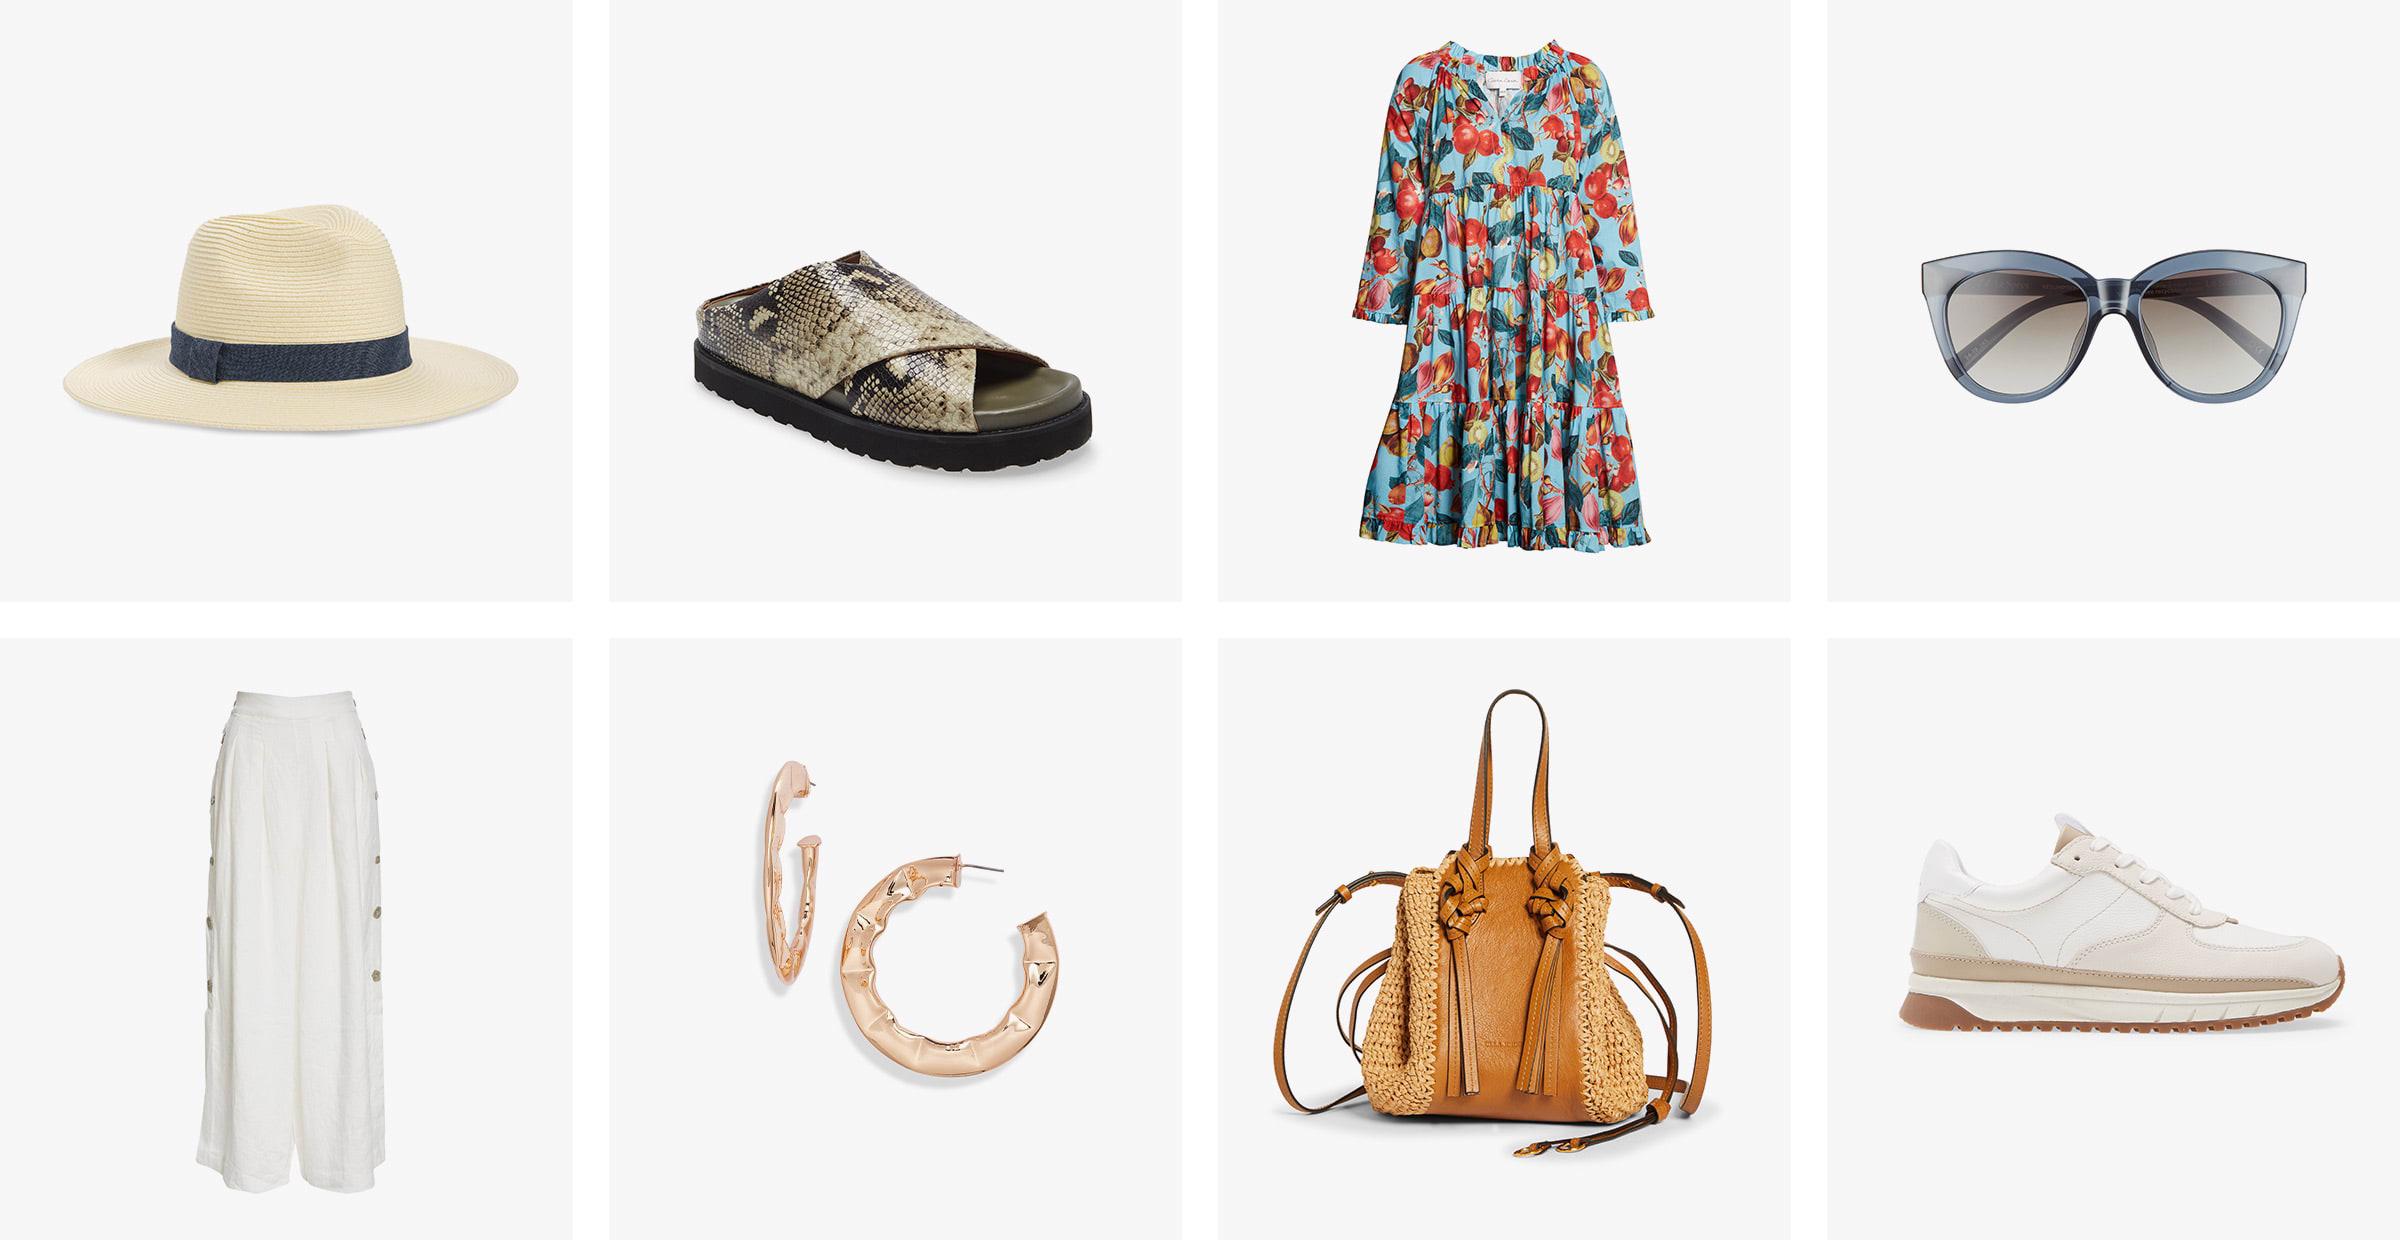 A women's straw hat, sandals, print dress, sunglasses, white pants, hoop earrings, handbag and white sneakers.